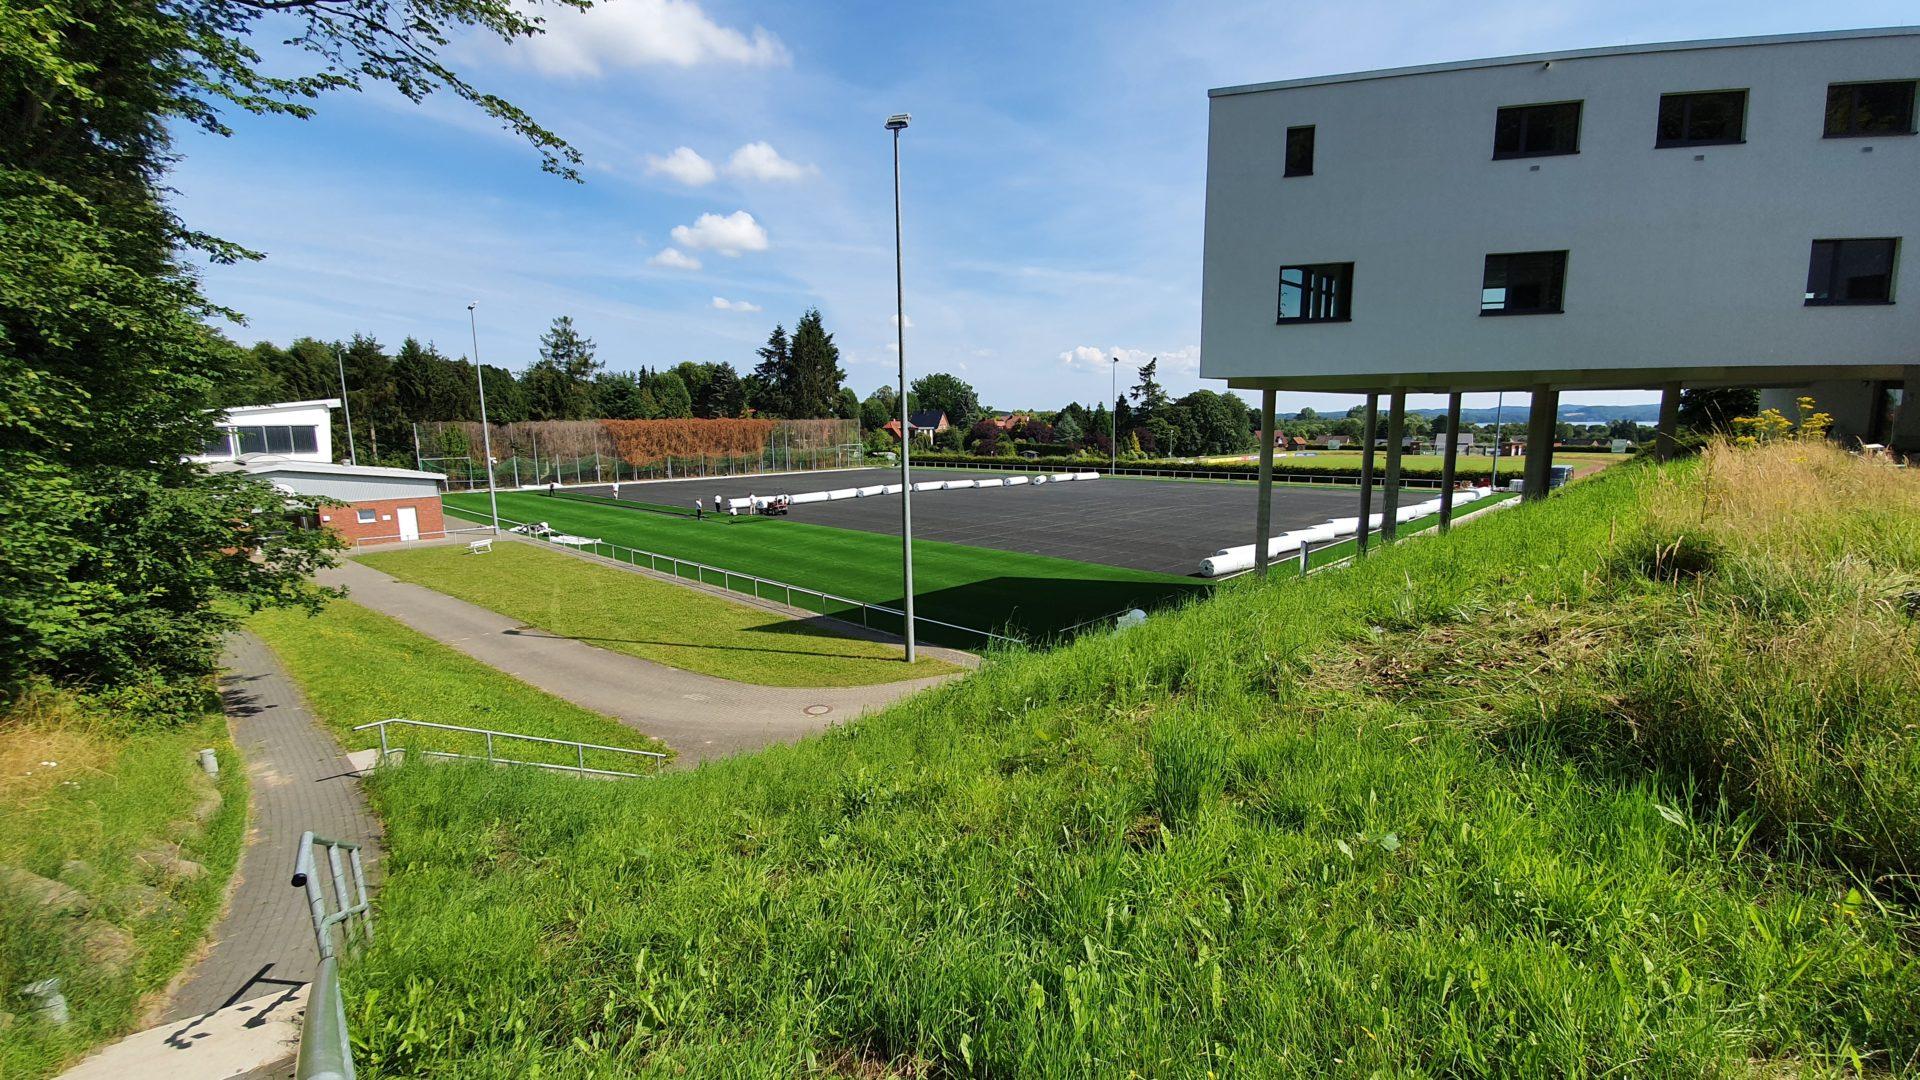 Uwe Seeler Park